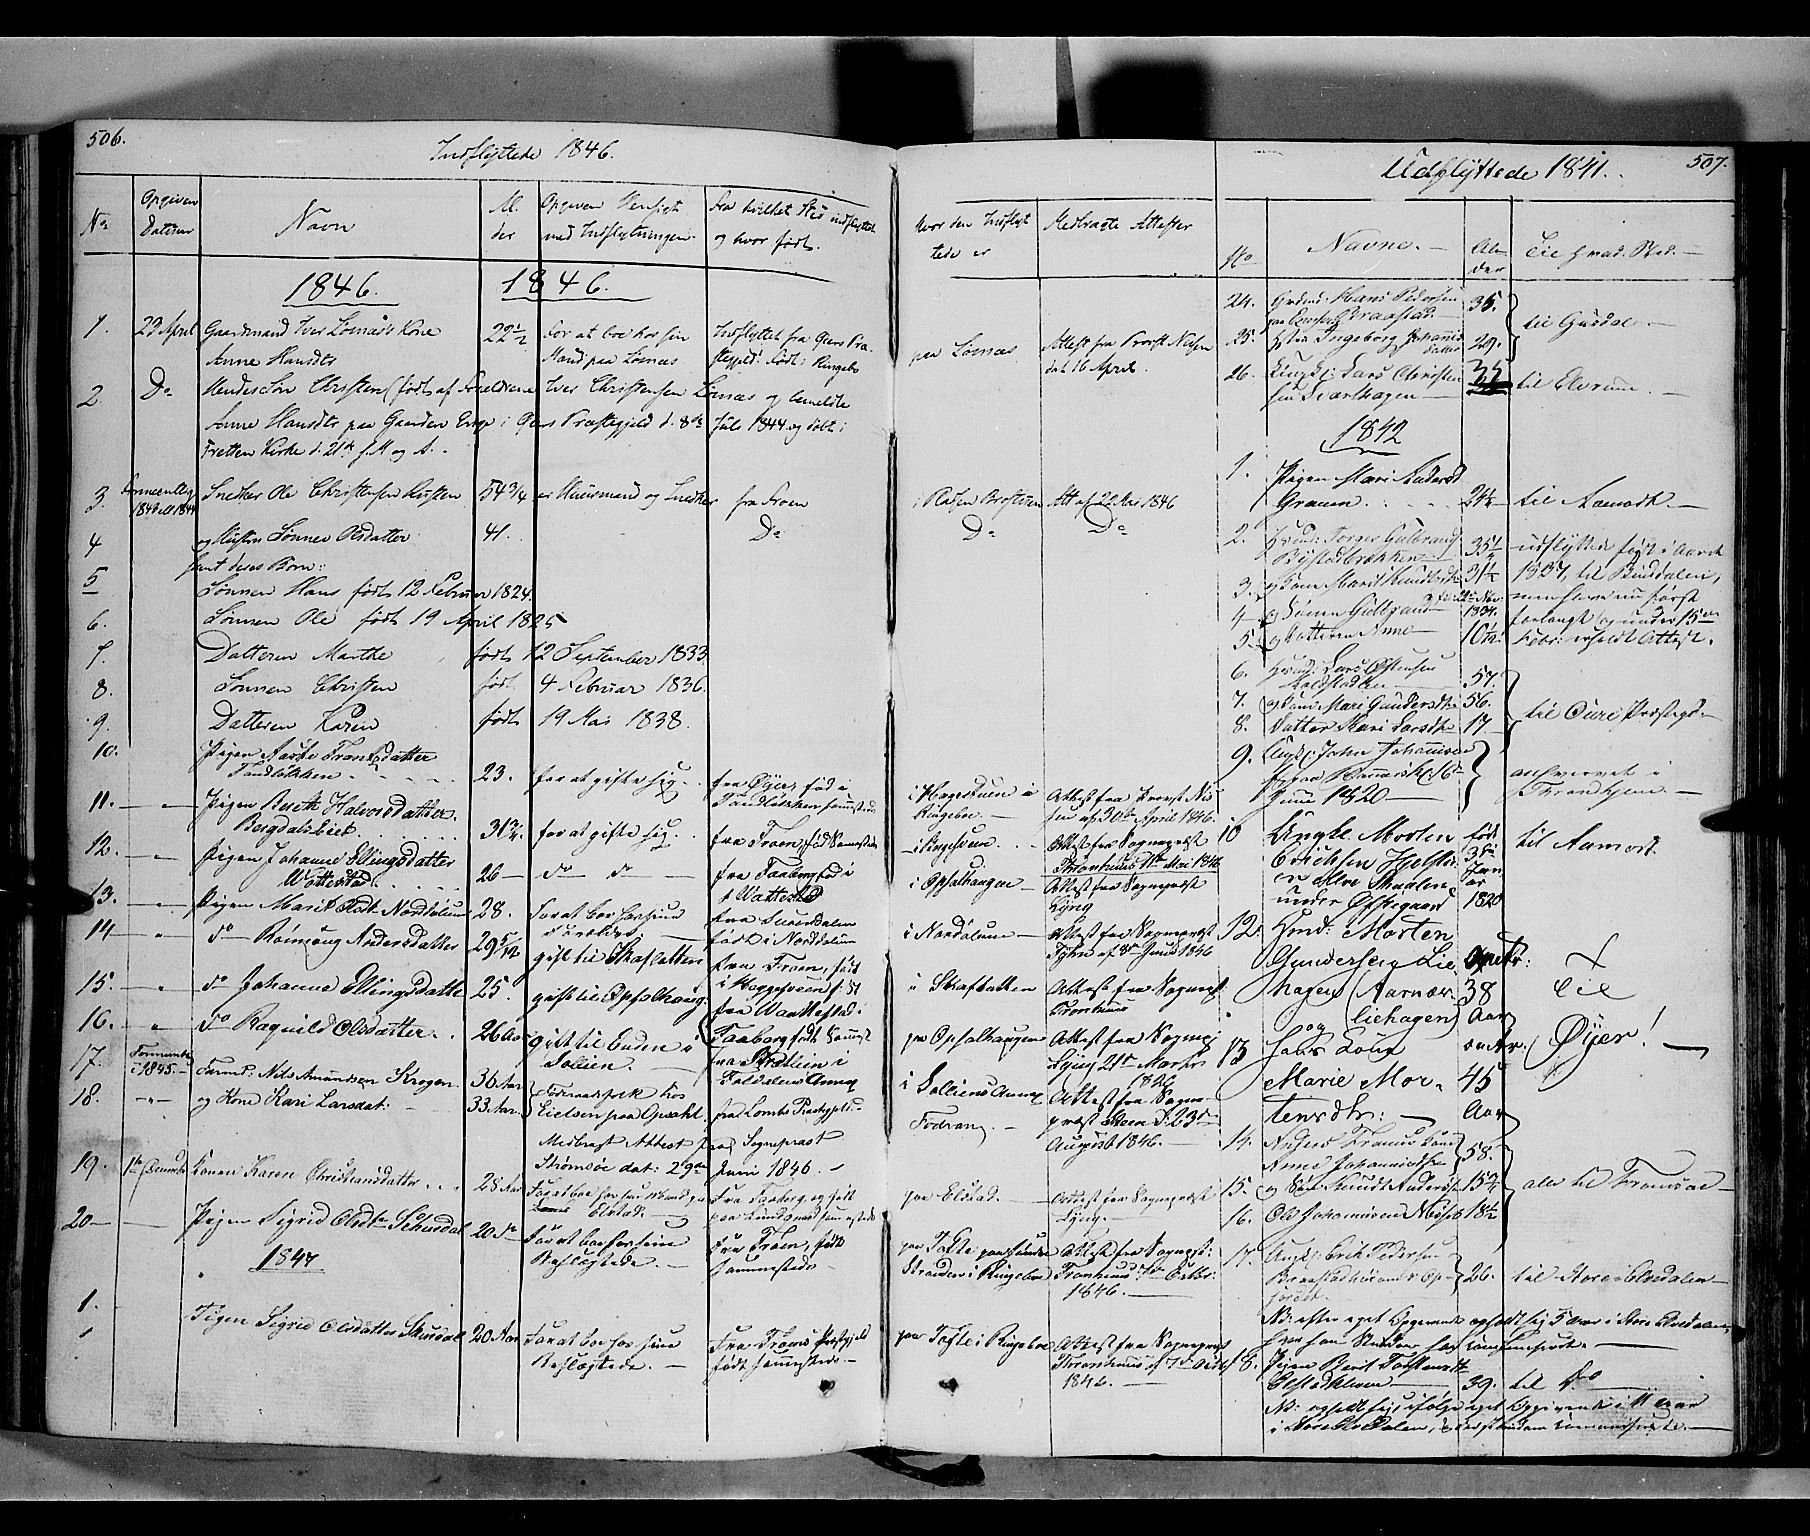 SAH, Ringebu prestekontor, Ministerialbok nr. 5, 1839-1848, s. 506-507